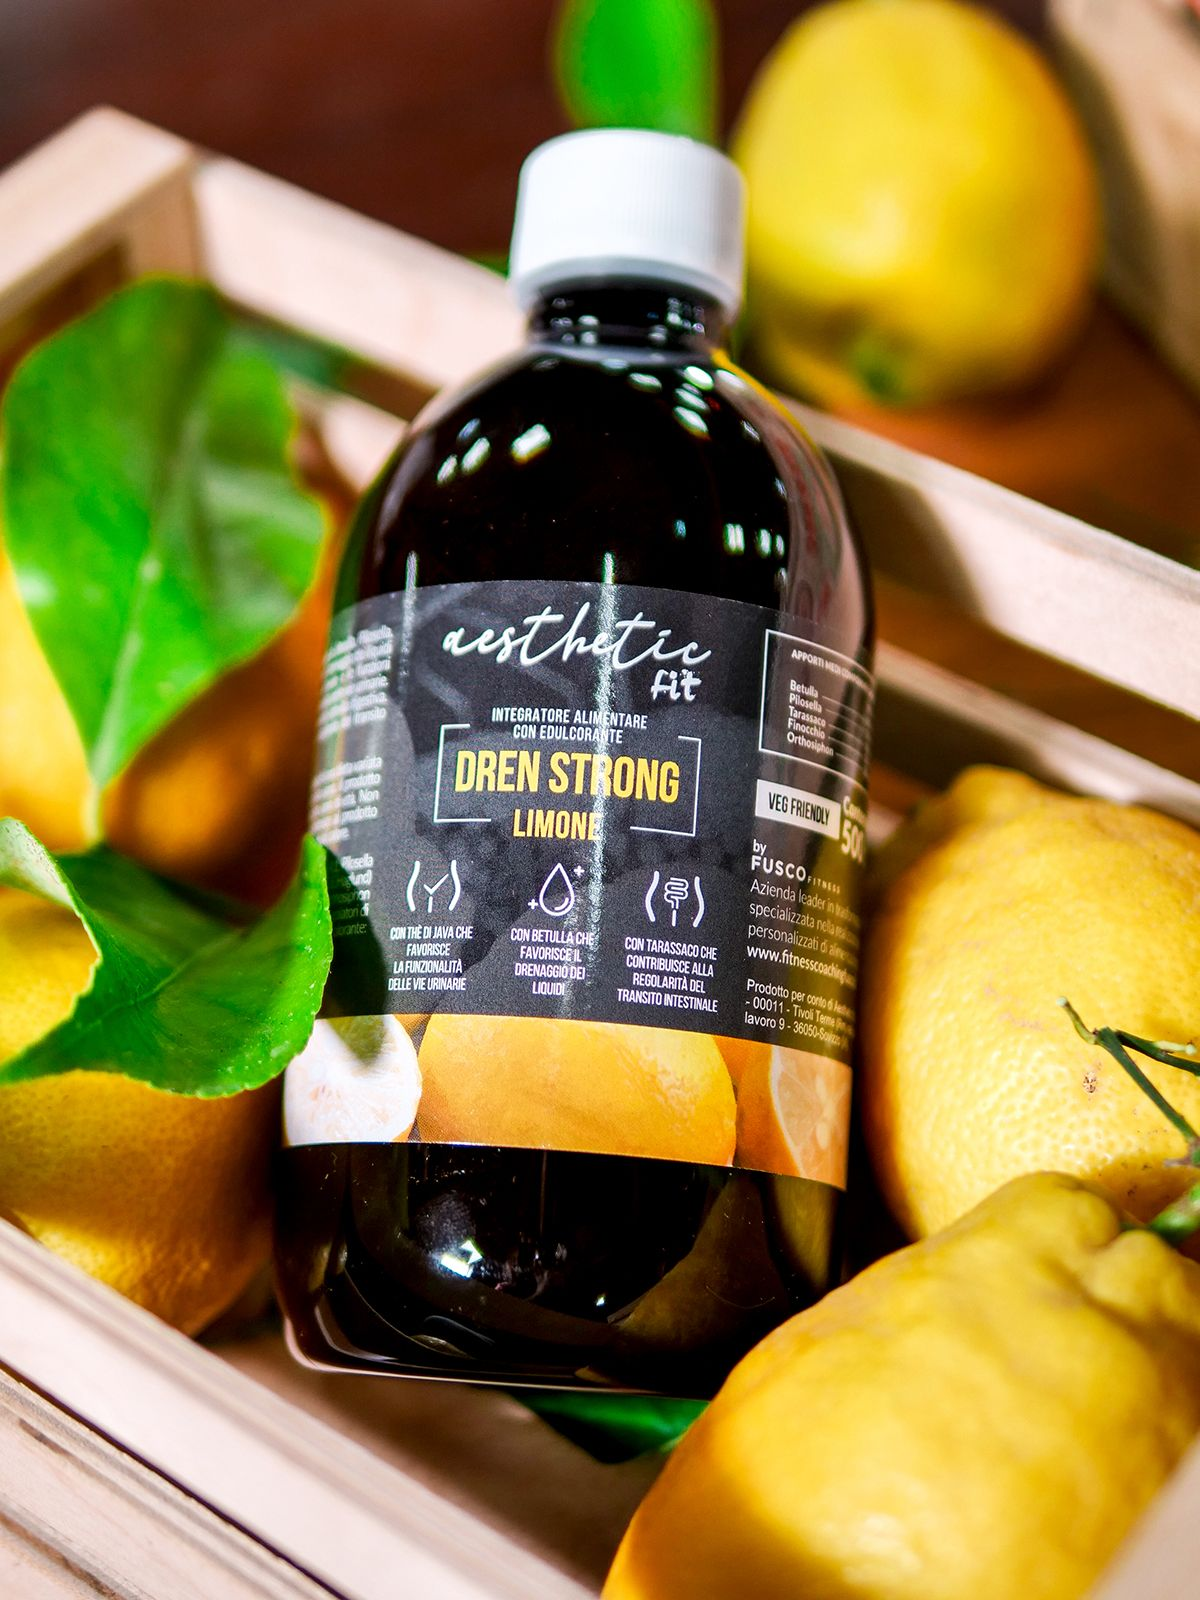 Dren Strong Limone